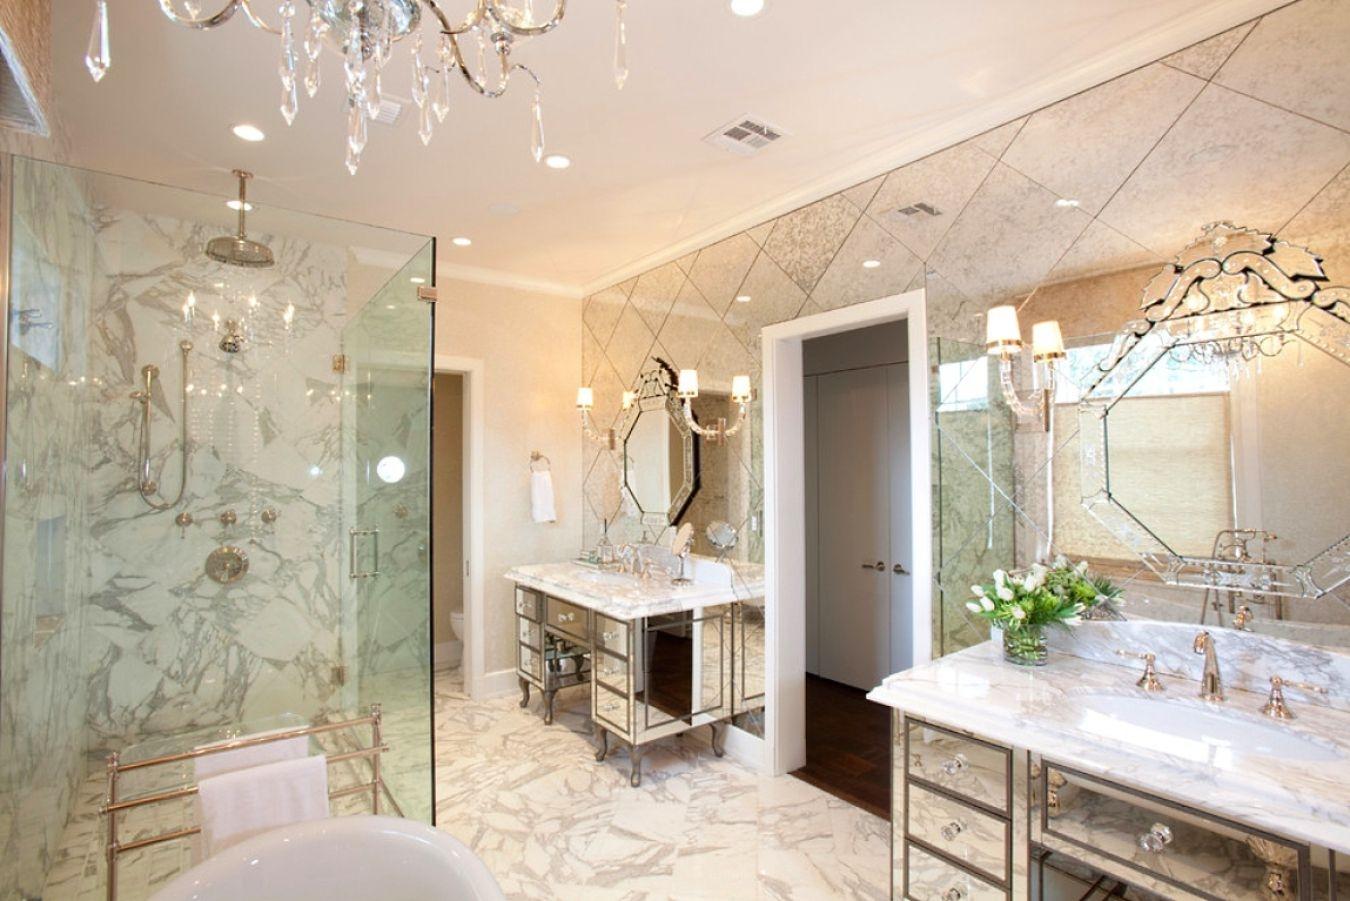 Bathroom With Mirror Tiles